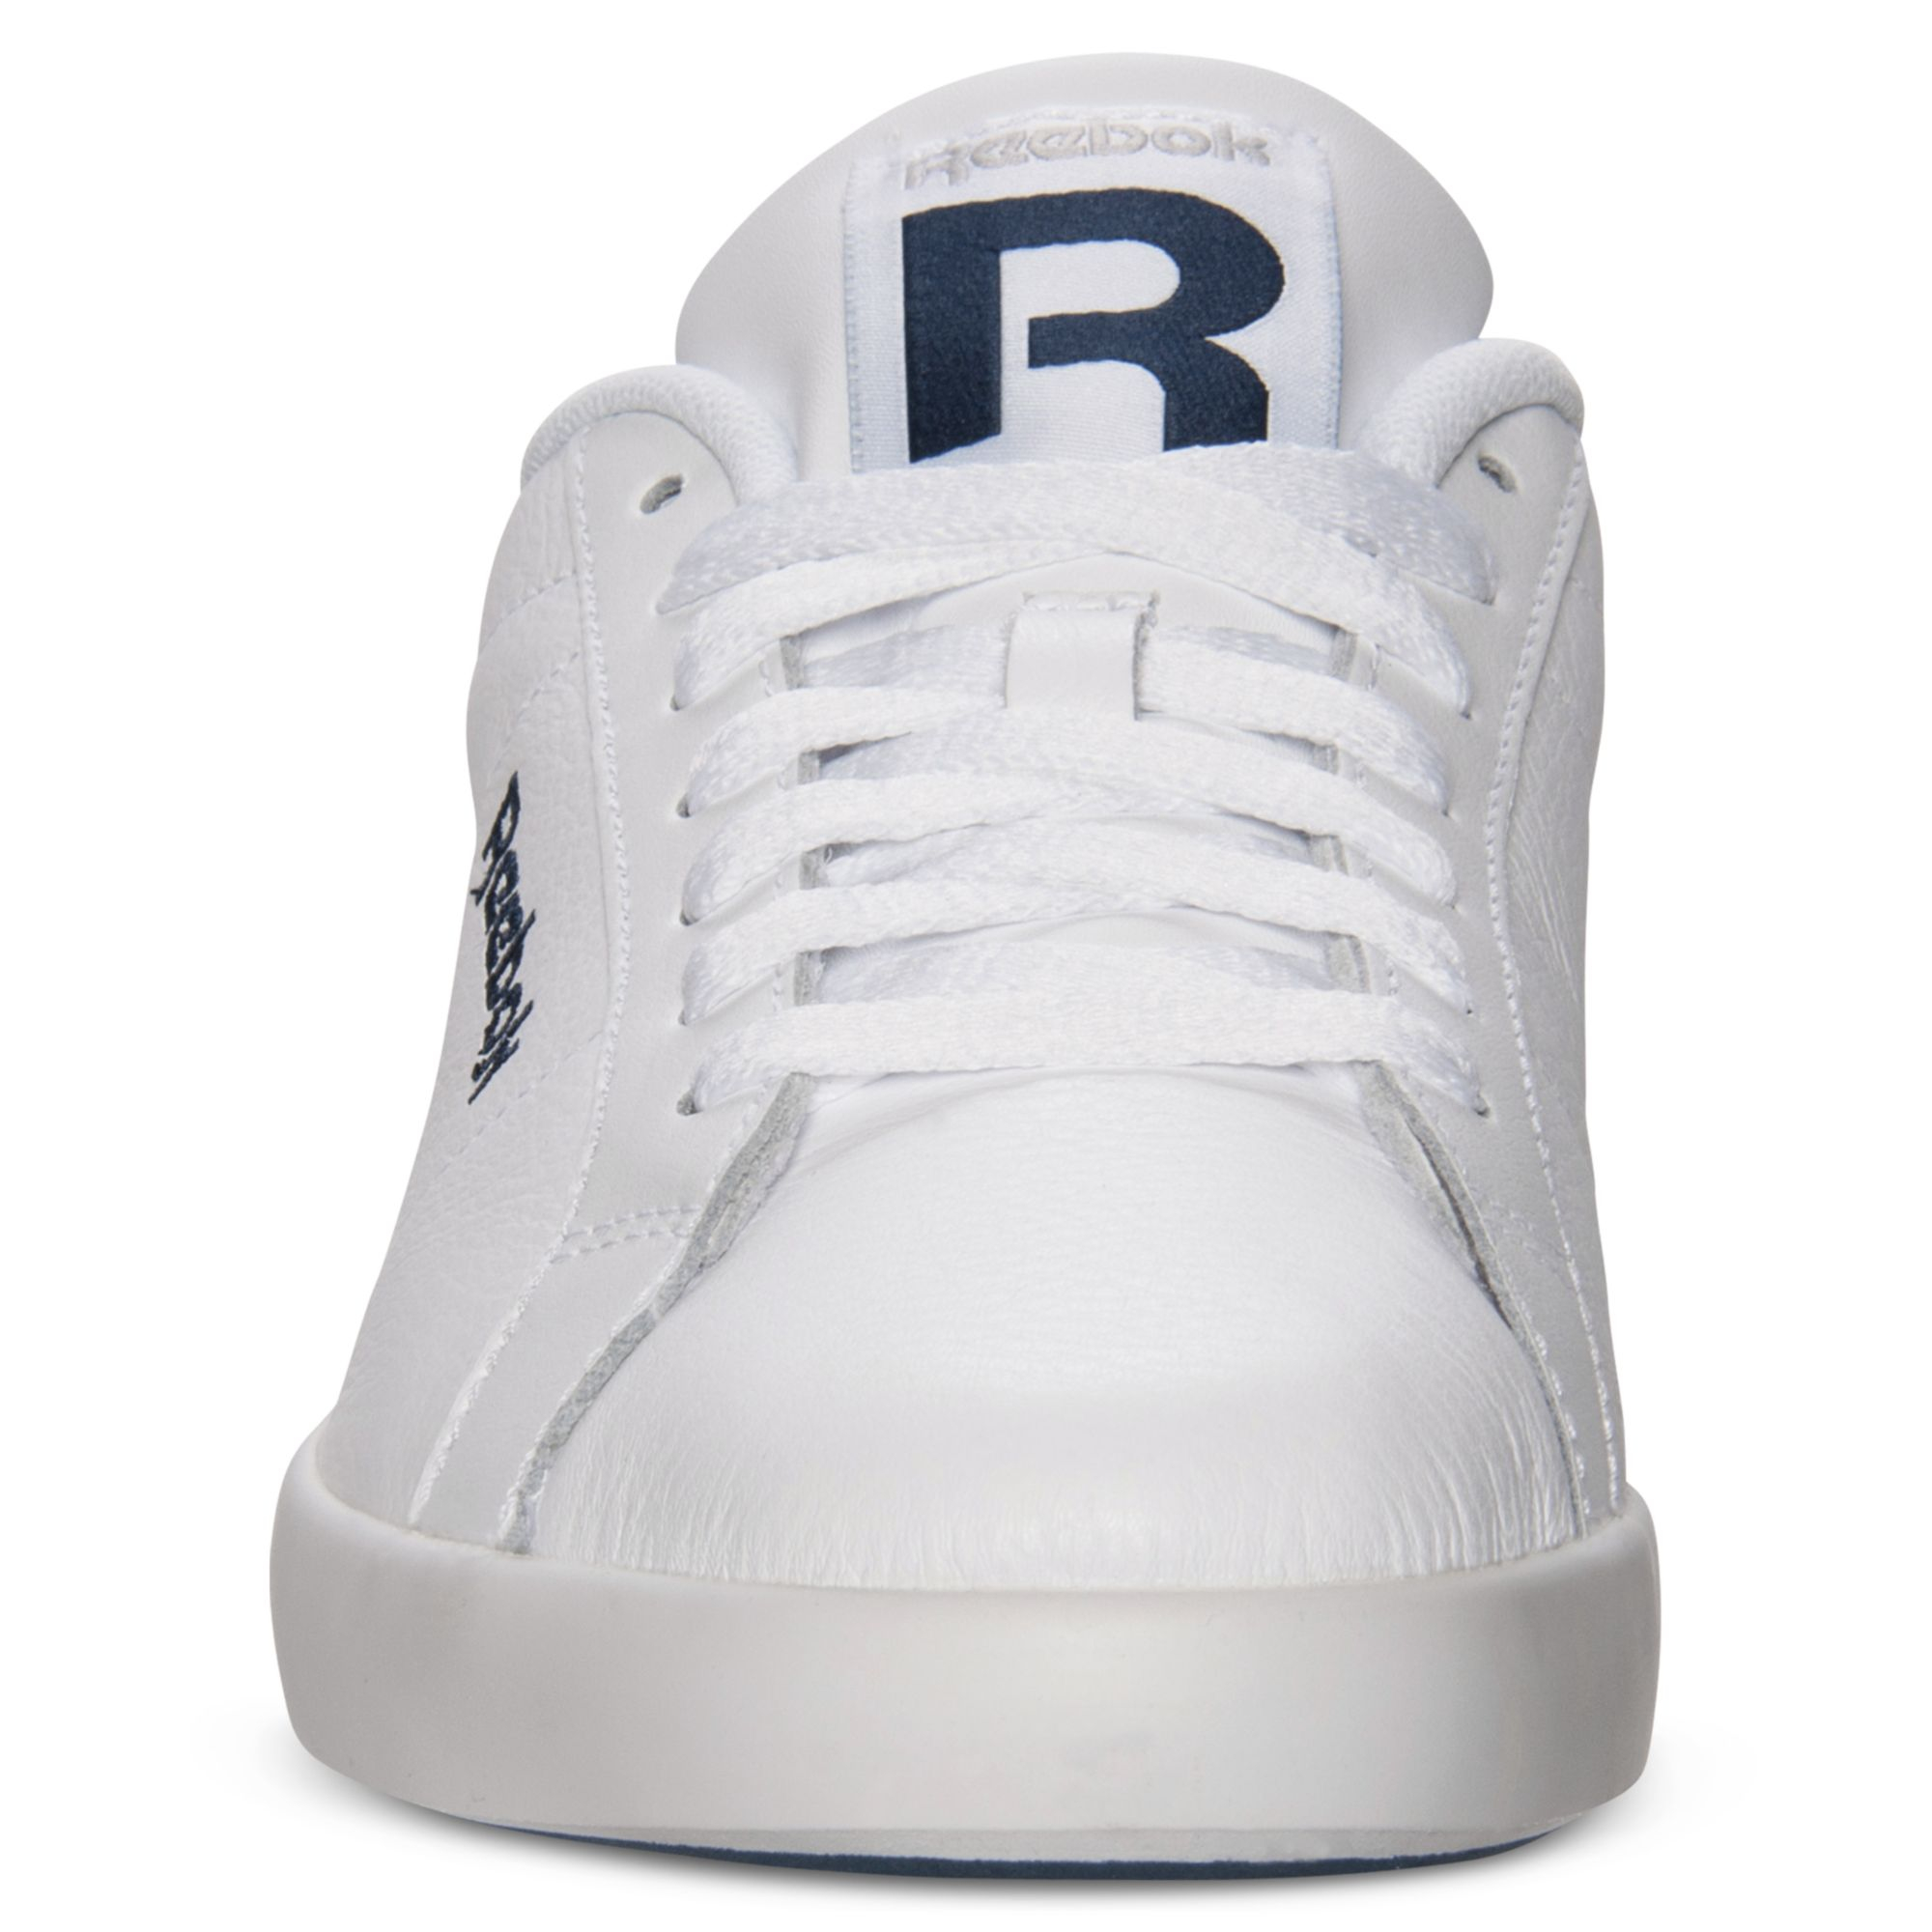 f43fbff0cdd2d Lyst - Reebok Sh Newport Low Casual Sneakers in White for Men